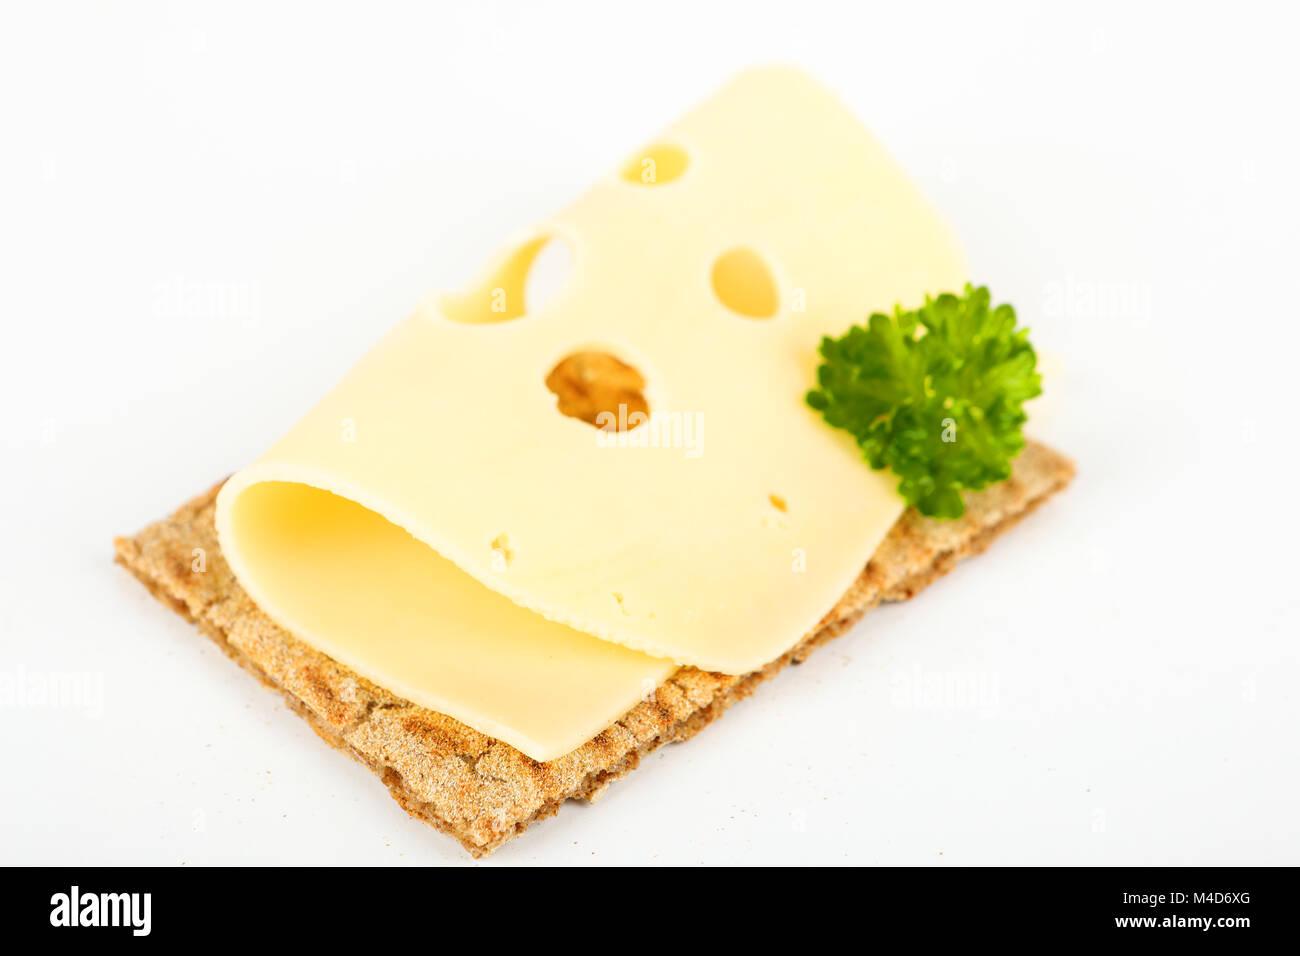 crispbread with cheese - Stock Image